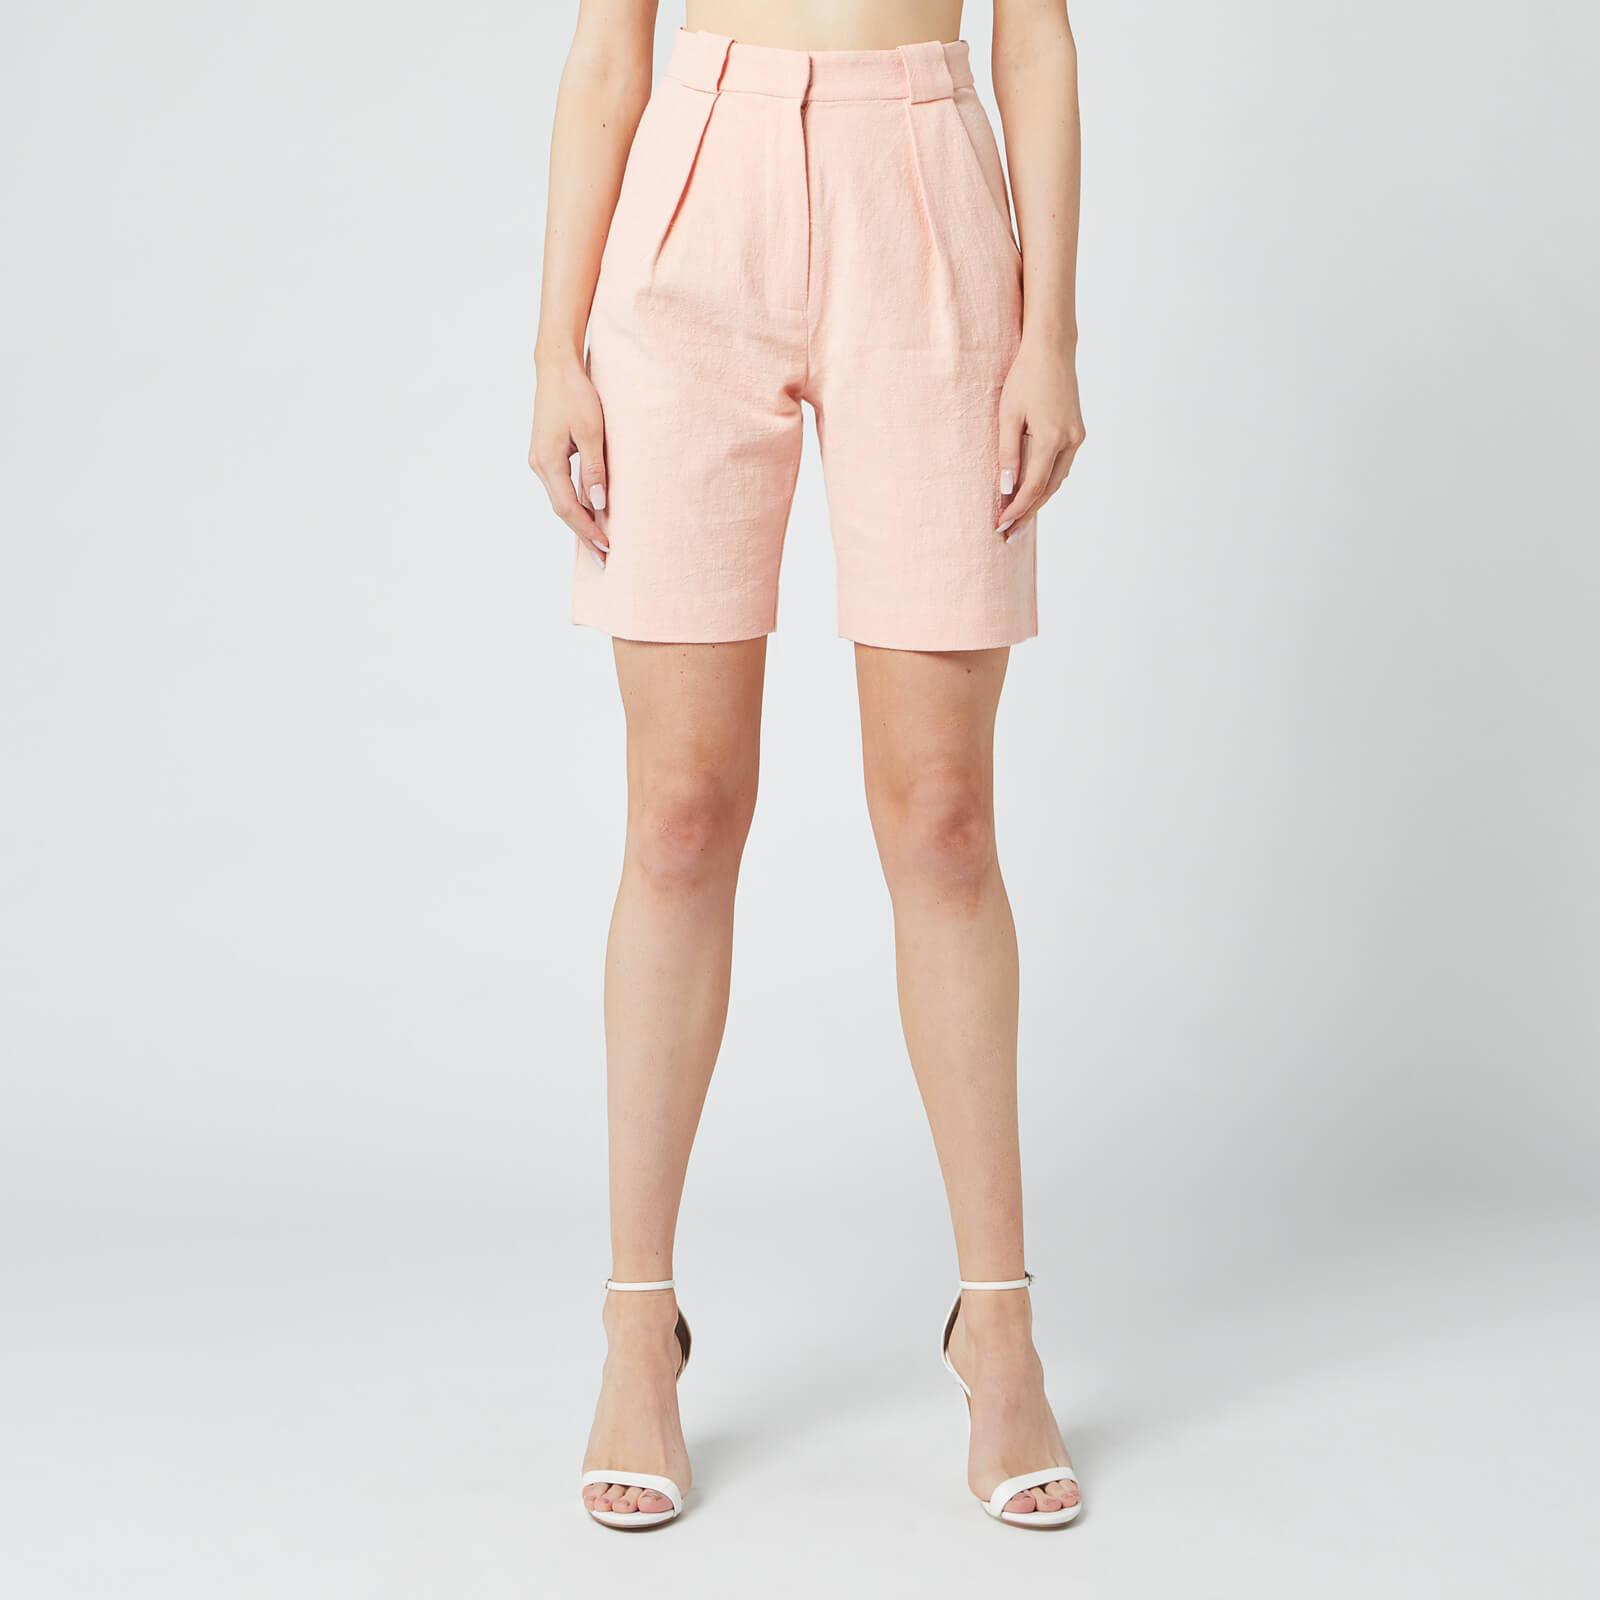 Bec & Bridge Women's Coral Club Shorts - Peach - UK 10